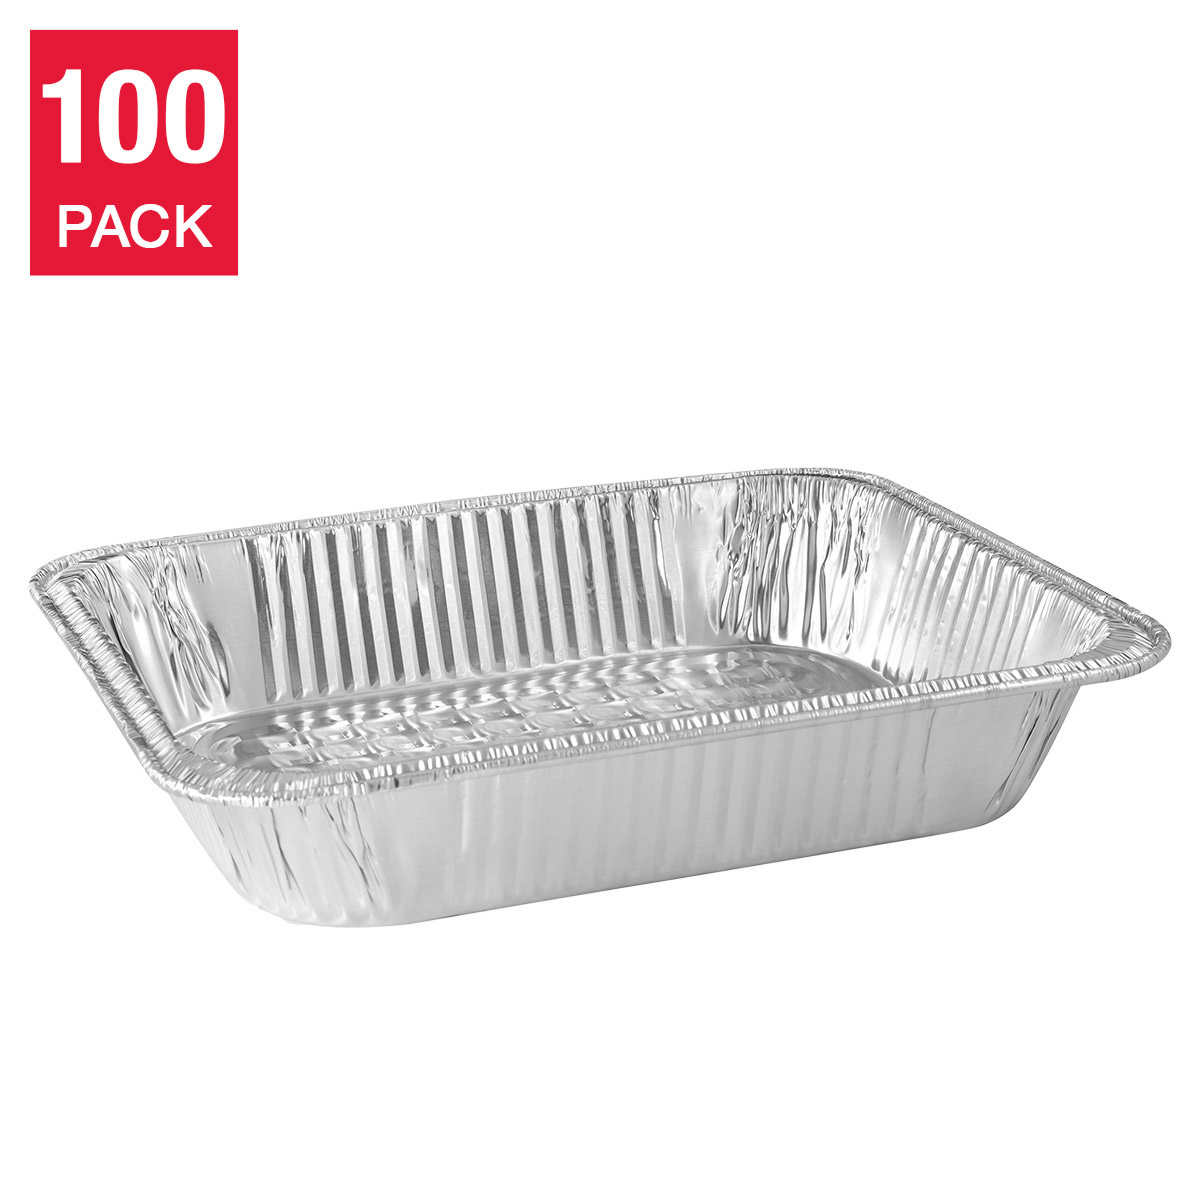 Titan Half Steam Deep Table Aluminum Pans, 100-count